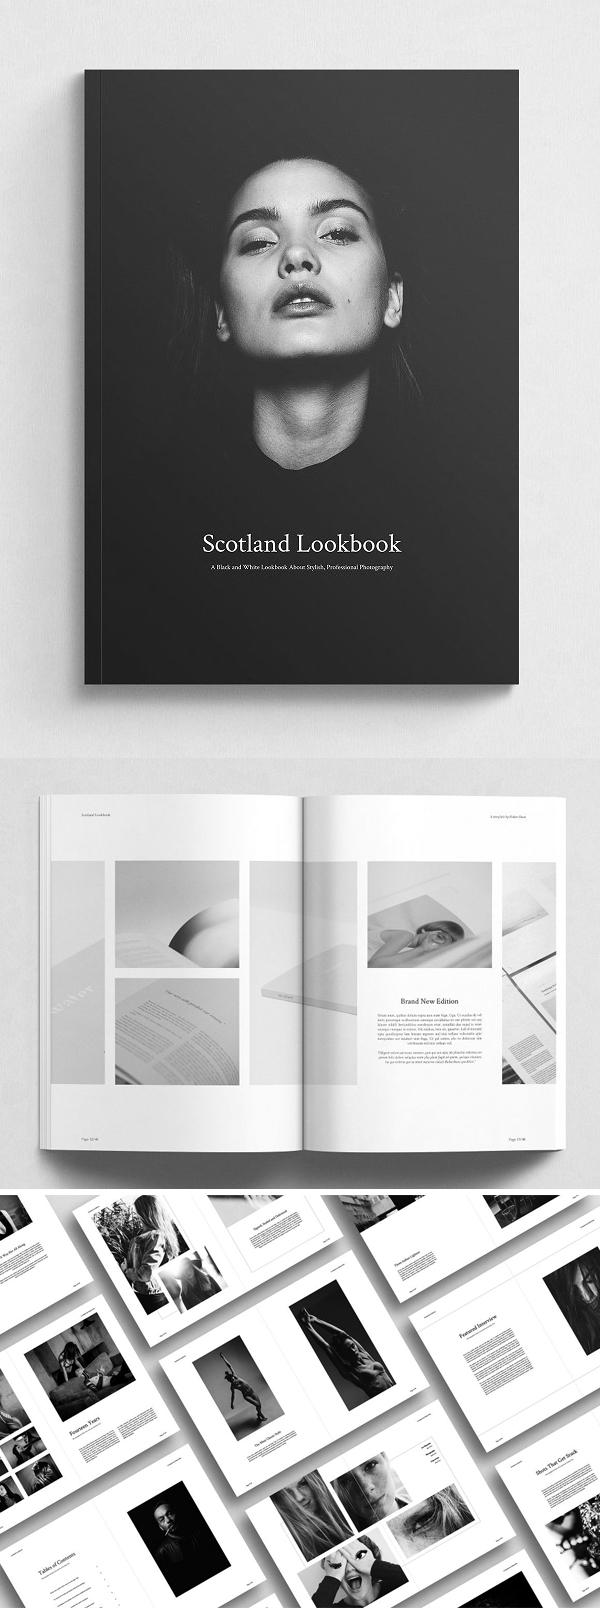 Scotland Lookbook